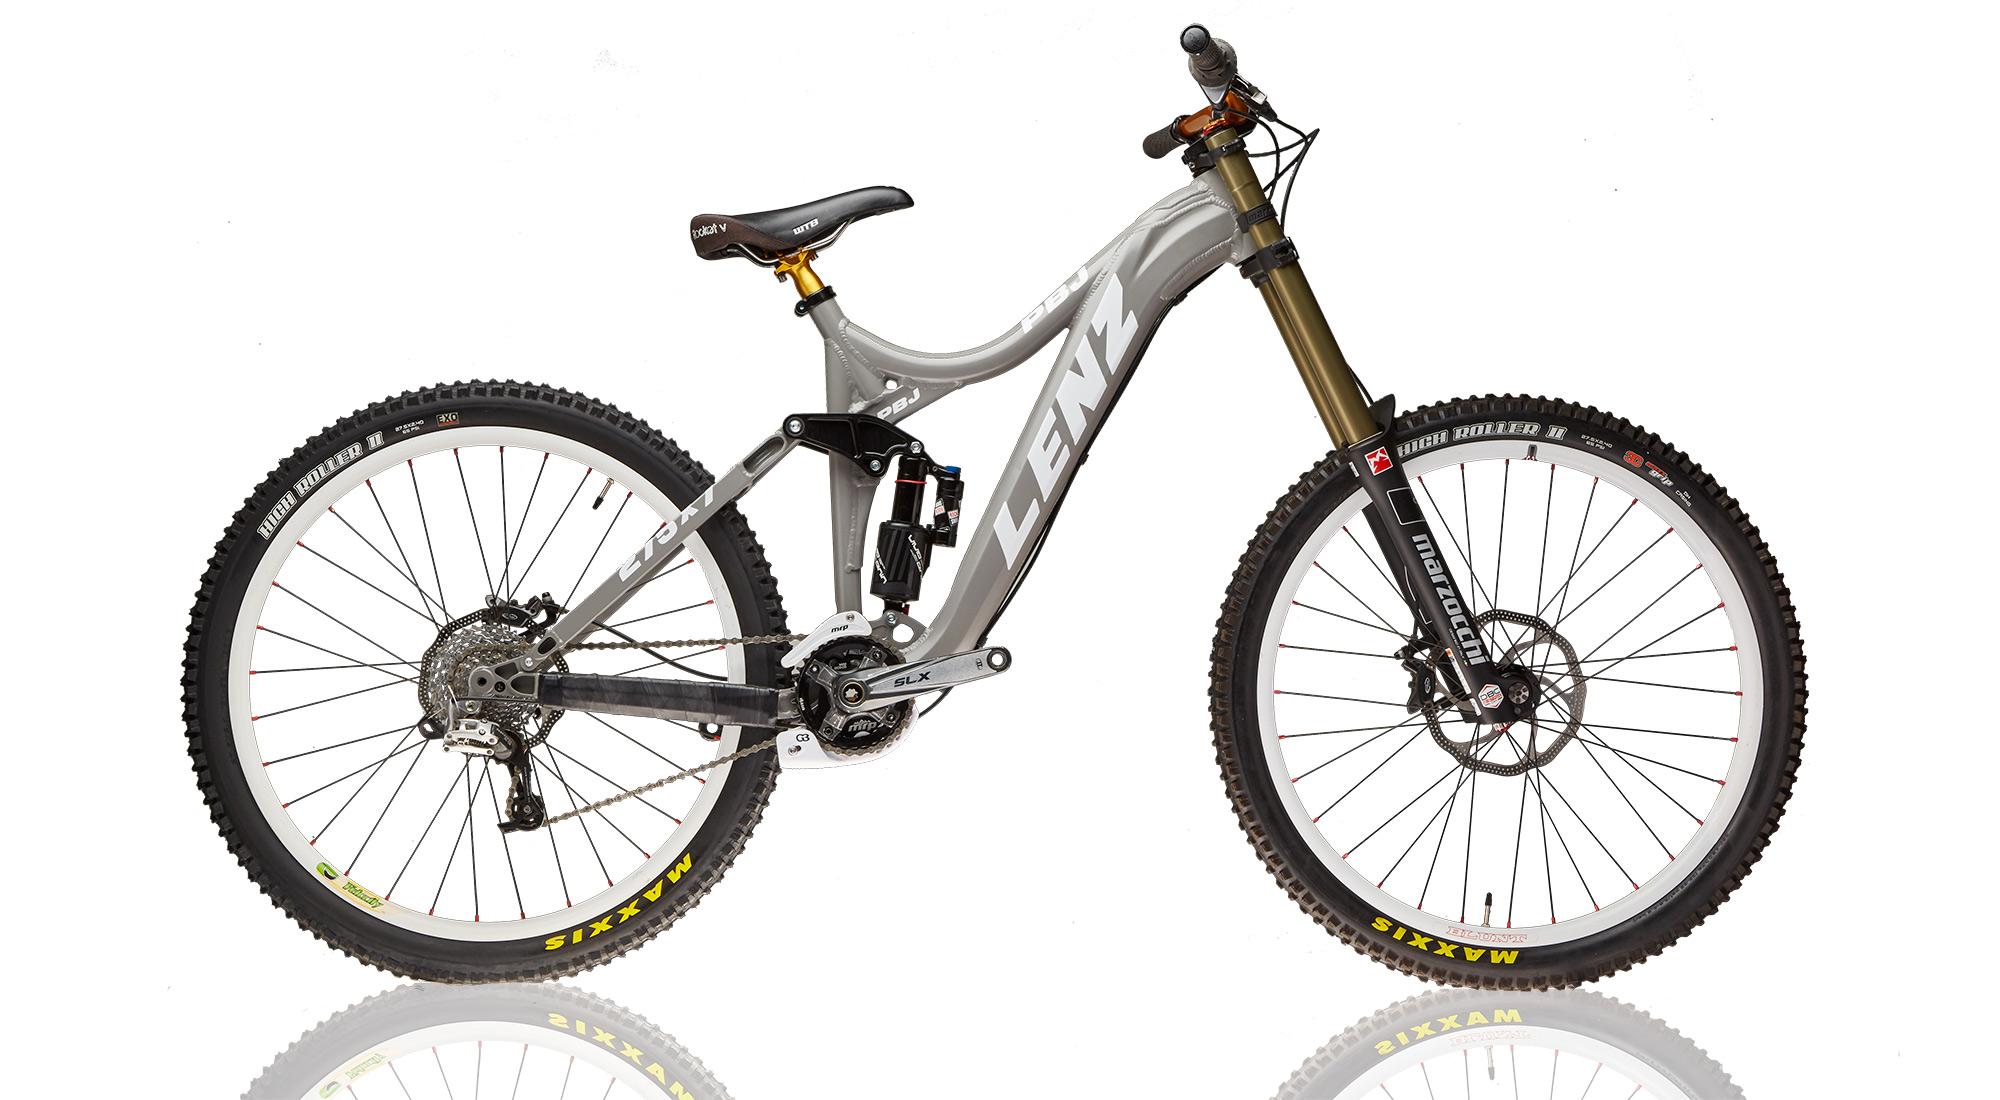 PBJ-Gray29er-Bike-2000x1100px